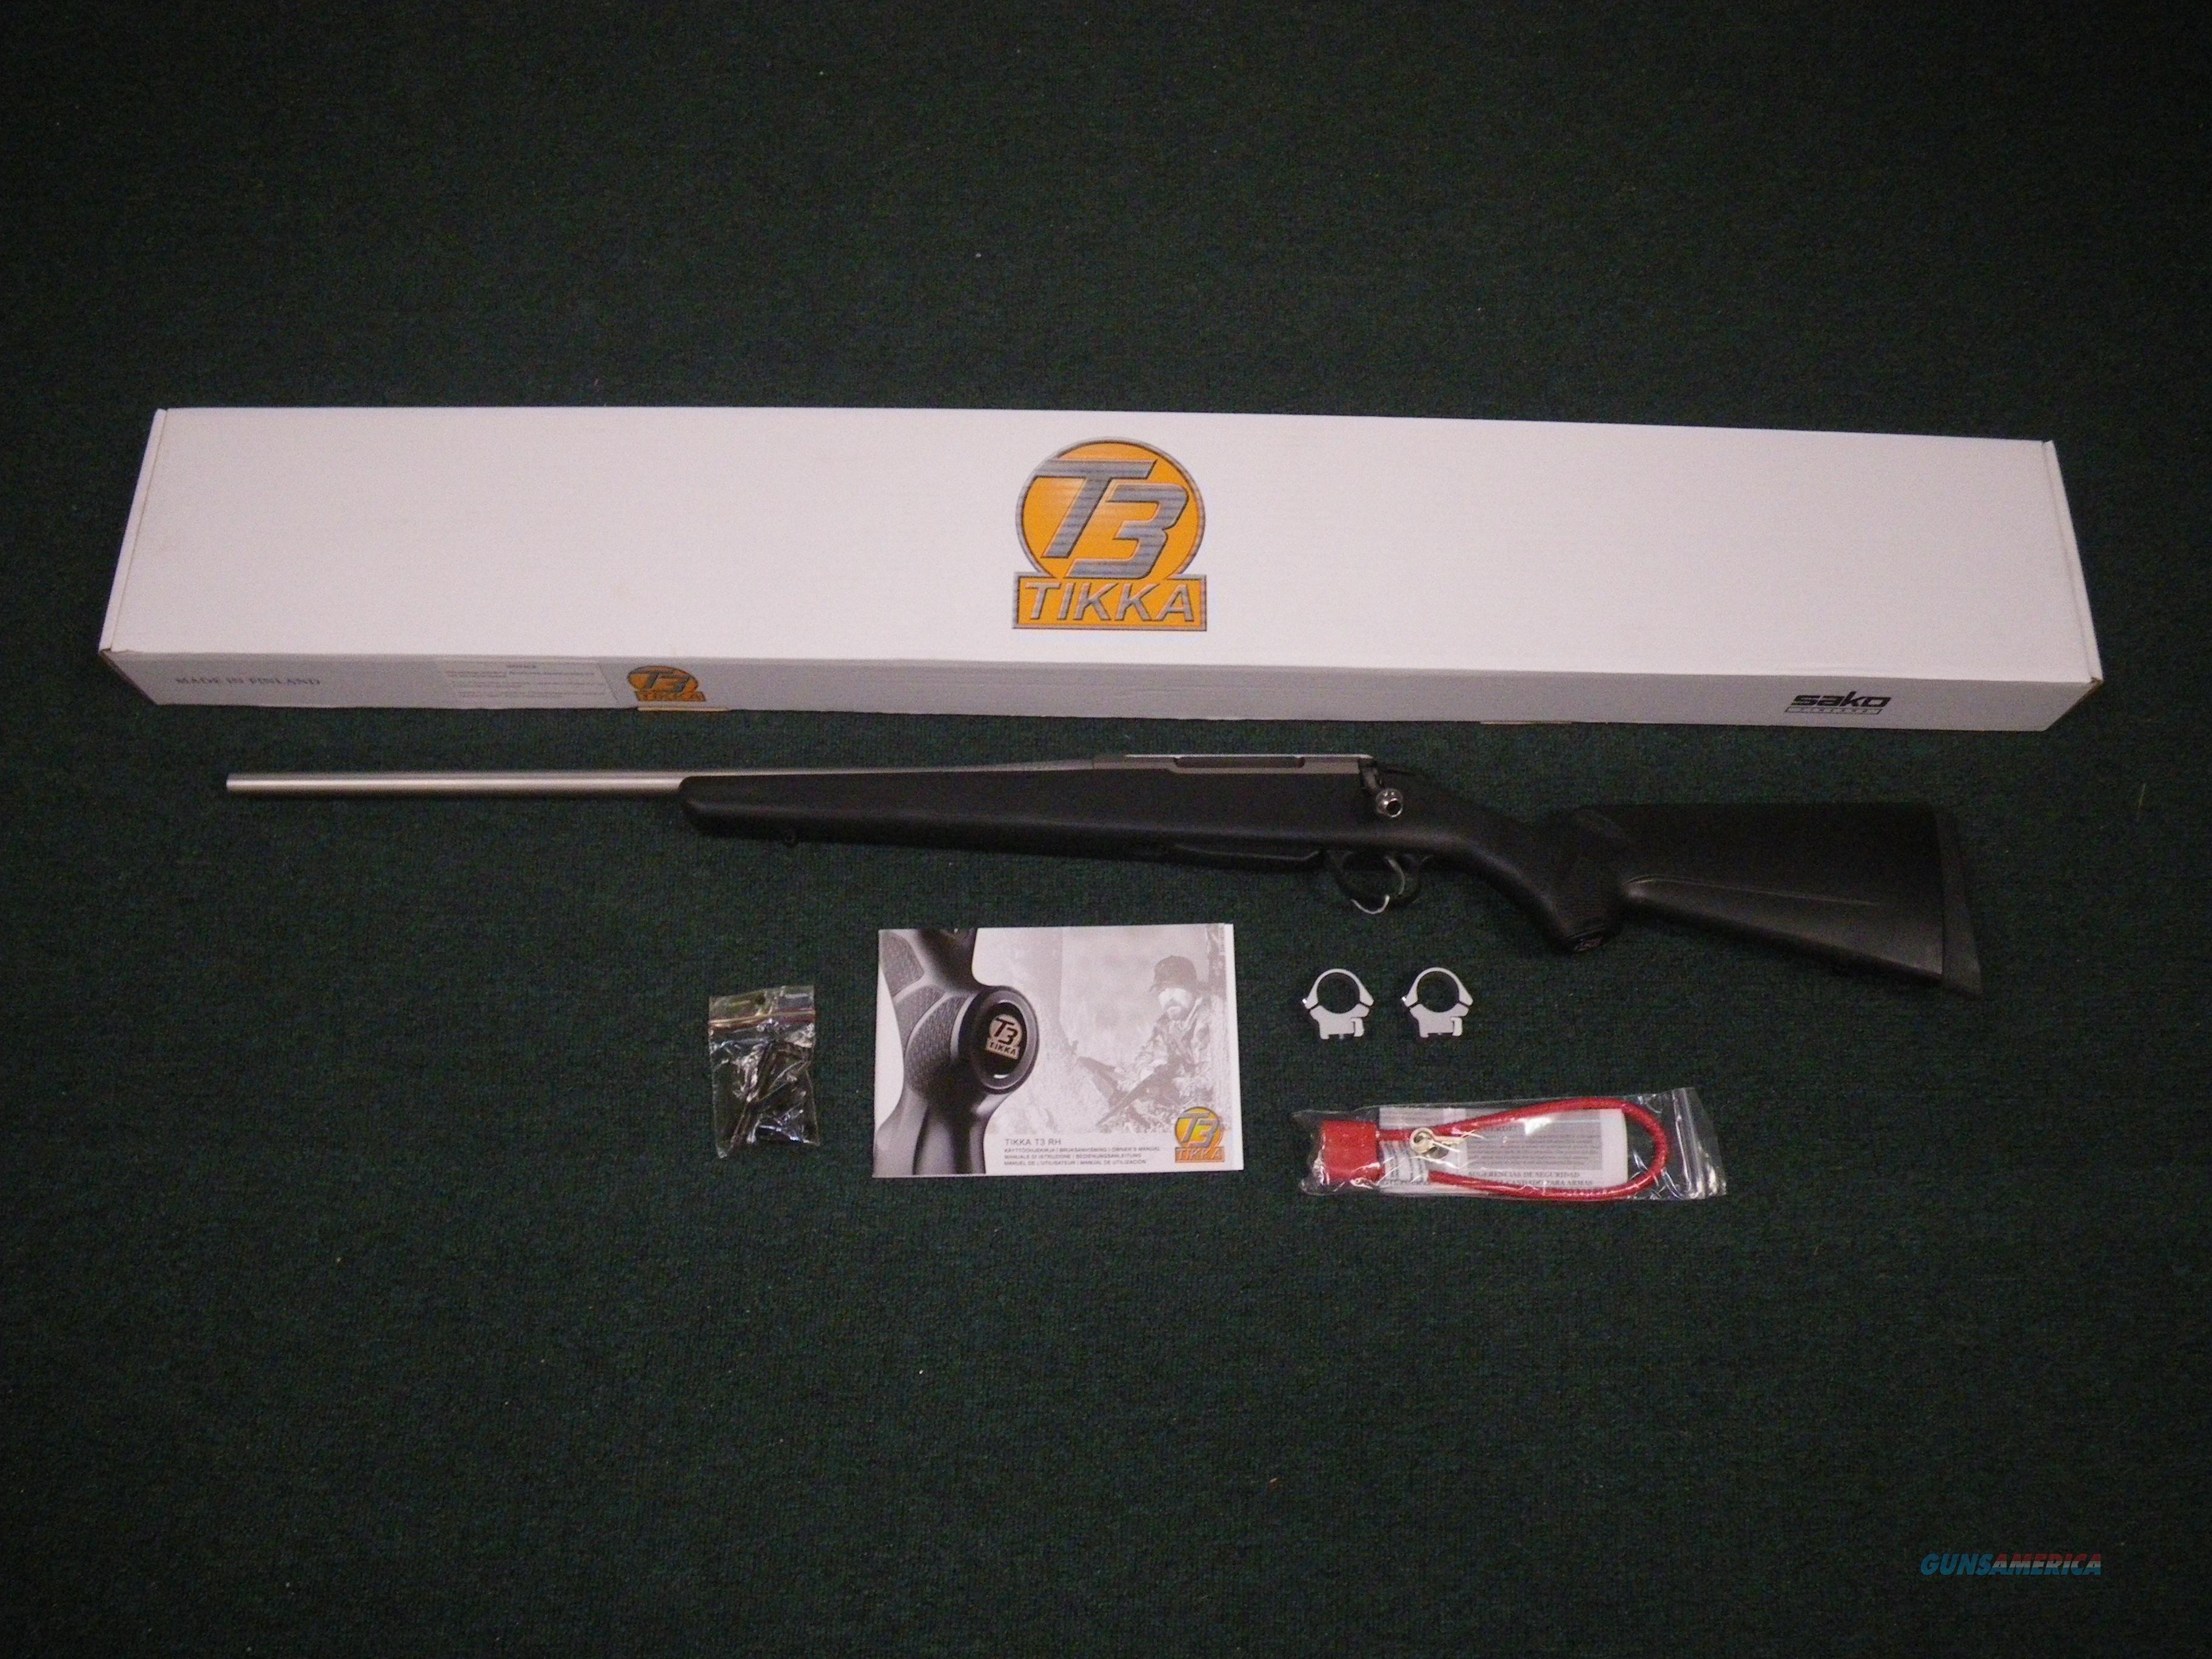 "Tikka T3 Lite Stainless Left Hand 30-06 22.5"" NIB #JRTB420  Guns > Rifles > Tikka Rifles > T3"